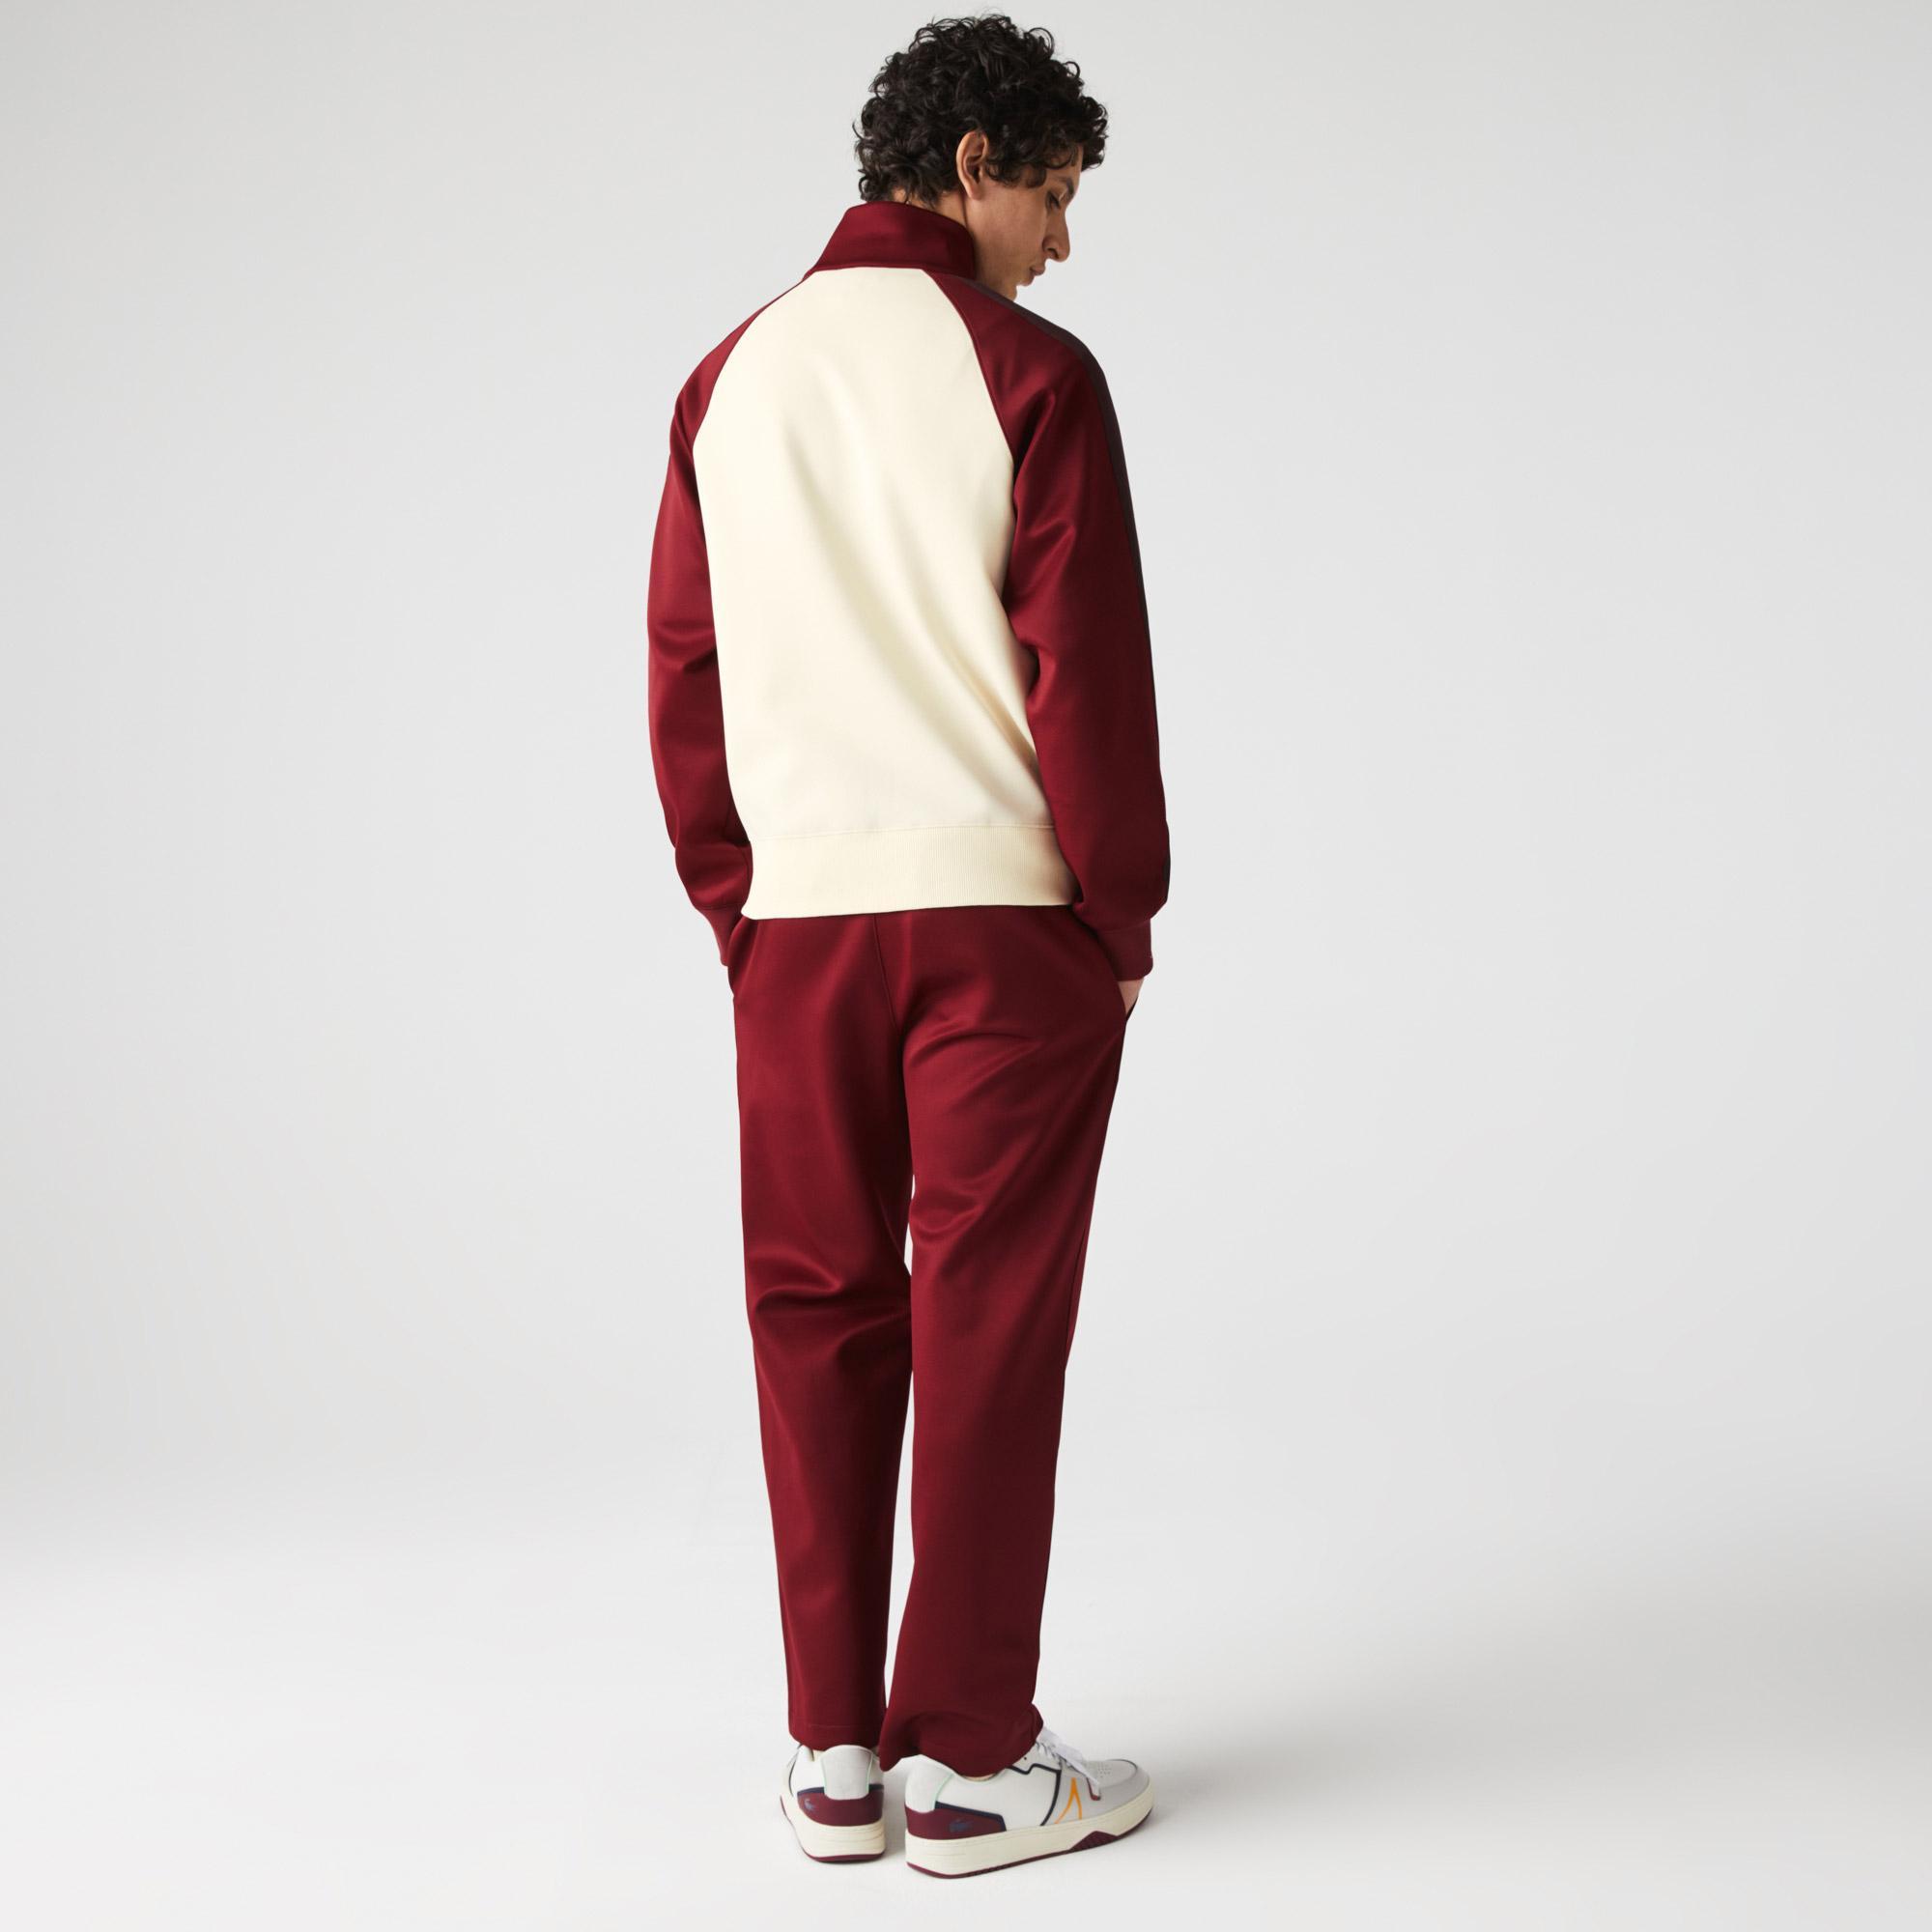 Lacoste Men's Colorblock Zippered High Neck Cotton Blend Sweatshirt